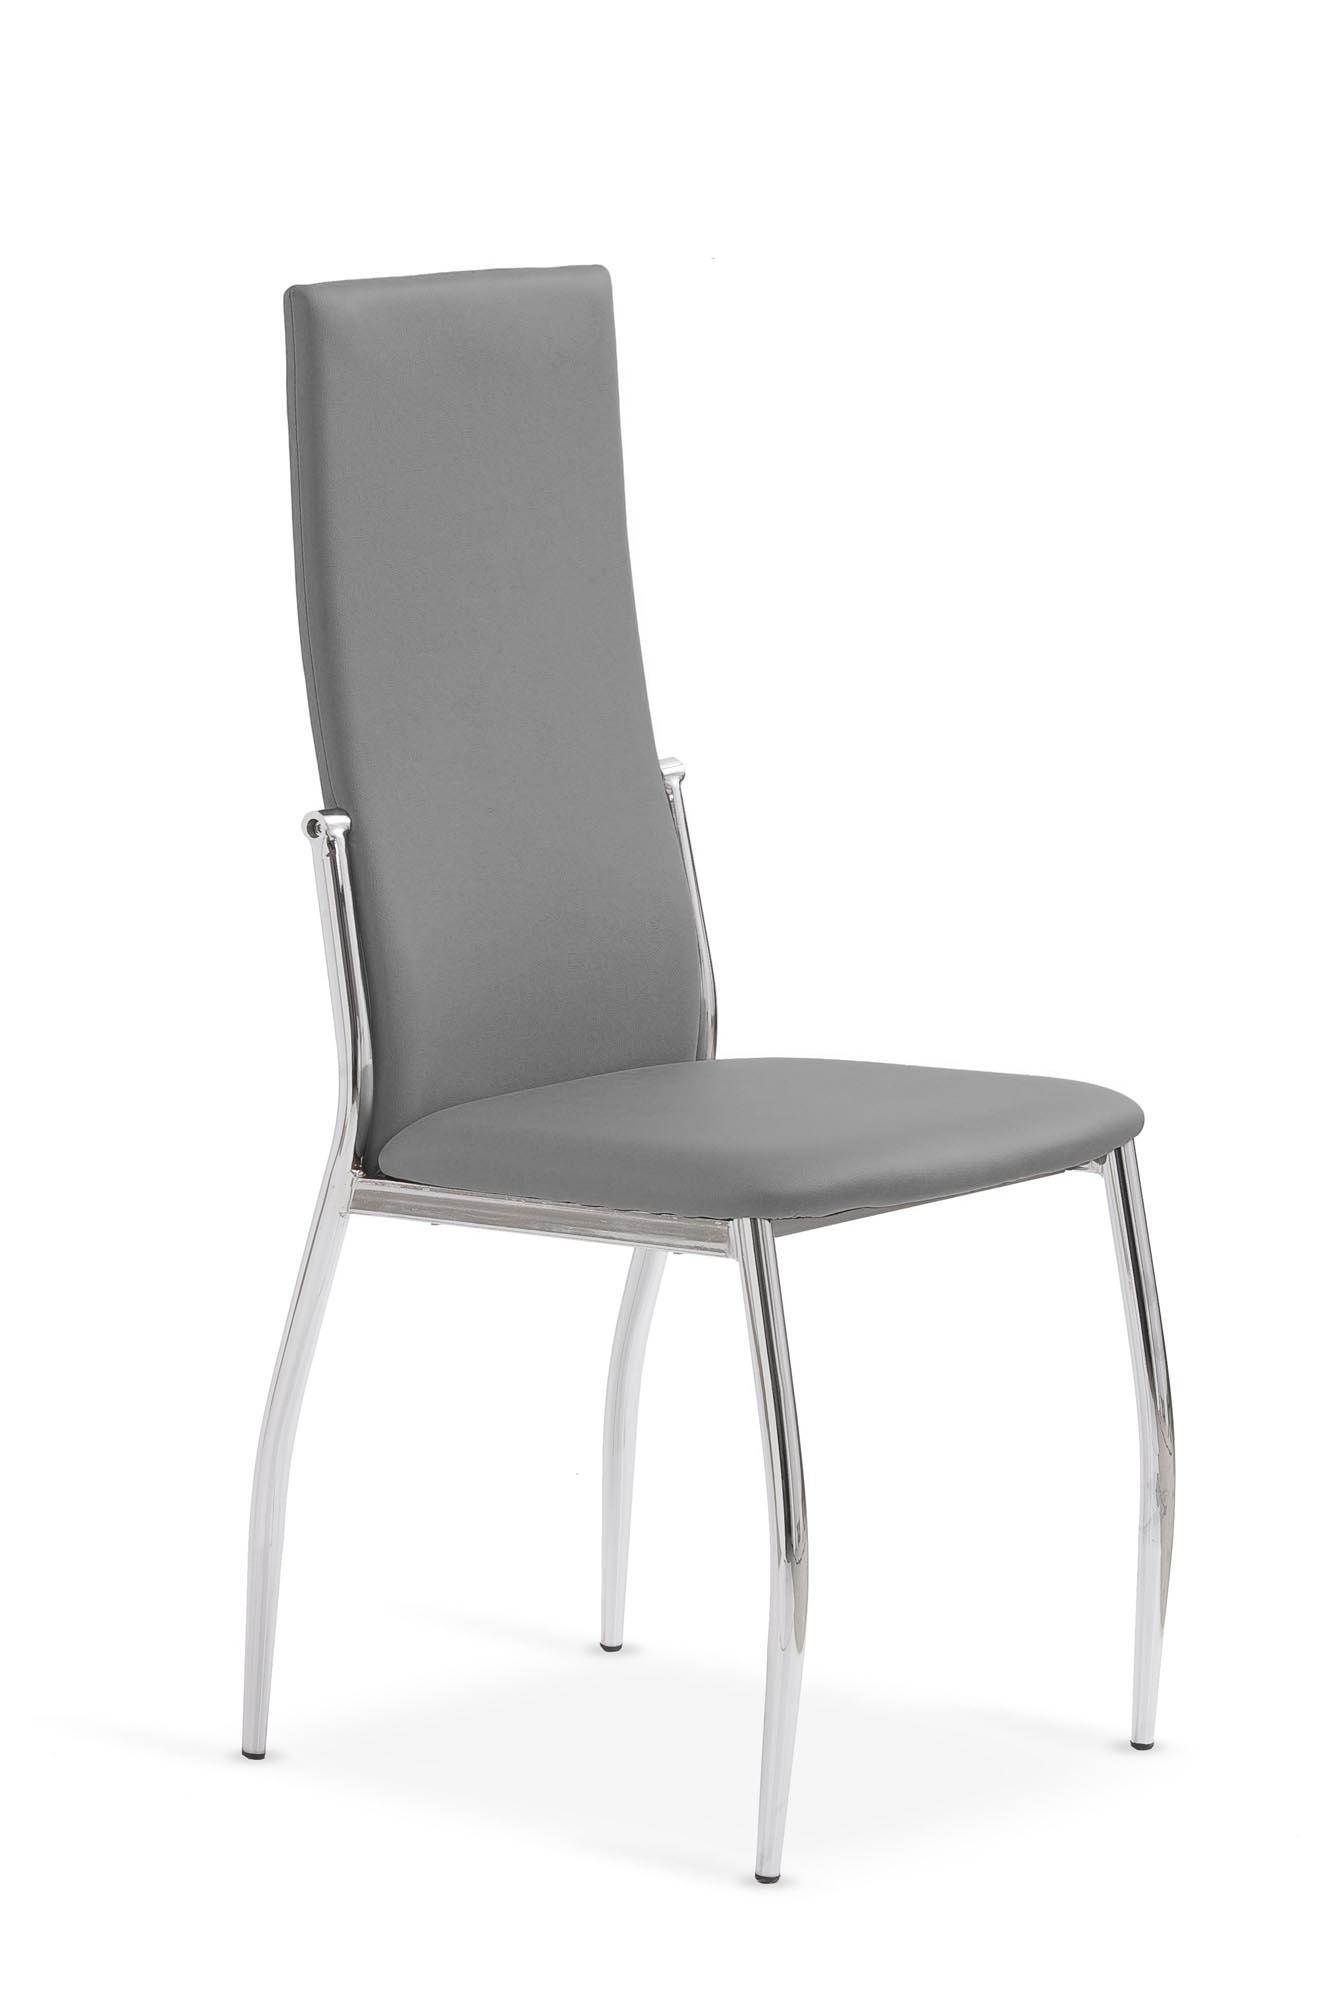 K3 stolička chróm/šedá